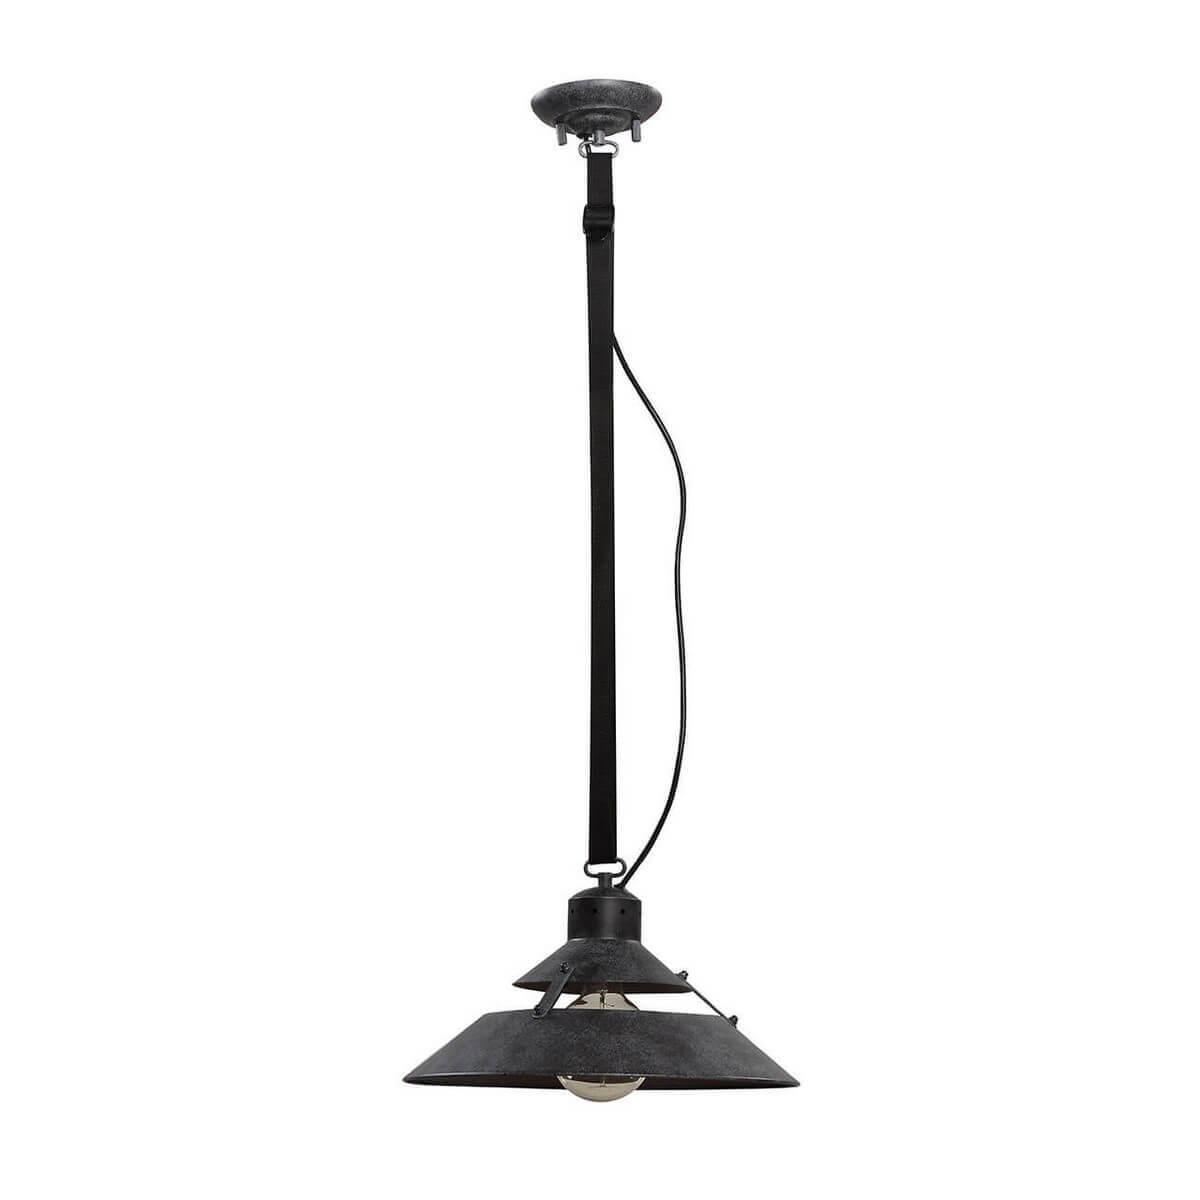 Светильник Mantra 5441 Industrial